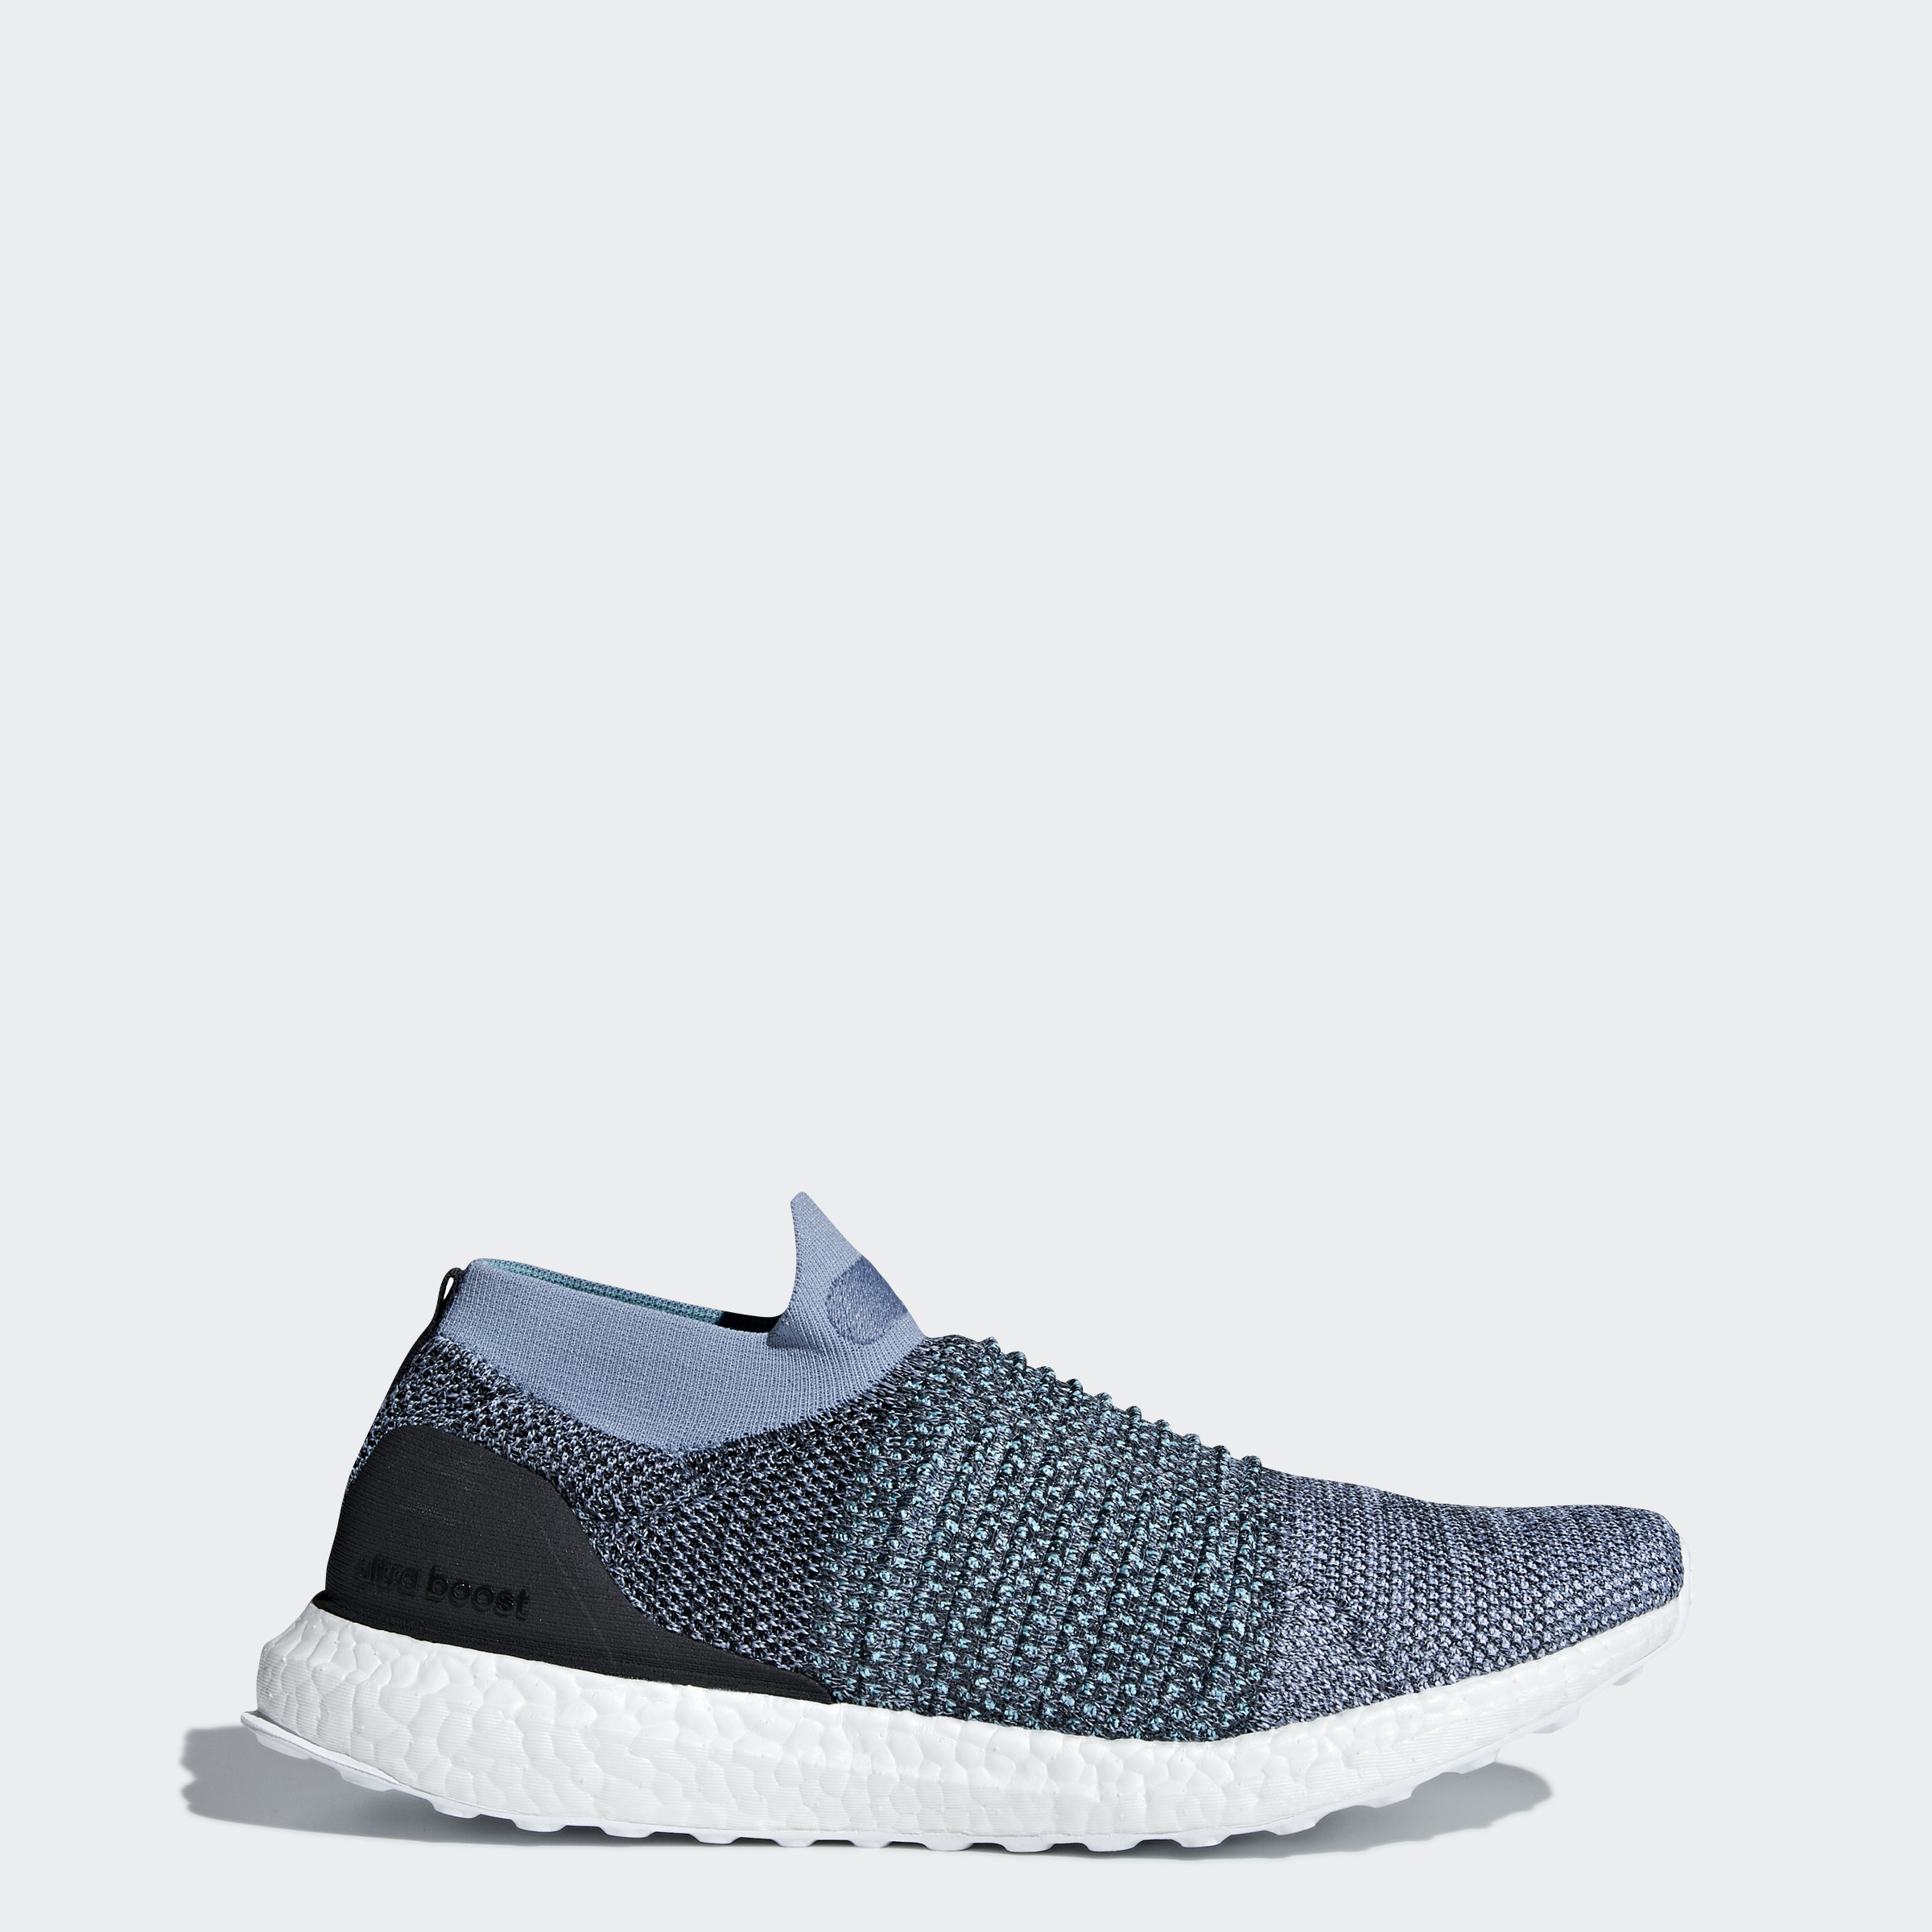 adidas-Ultraboost-Laceless-Parley-Shoes-Men-039-s thumbnail 10